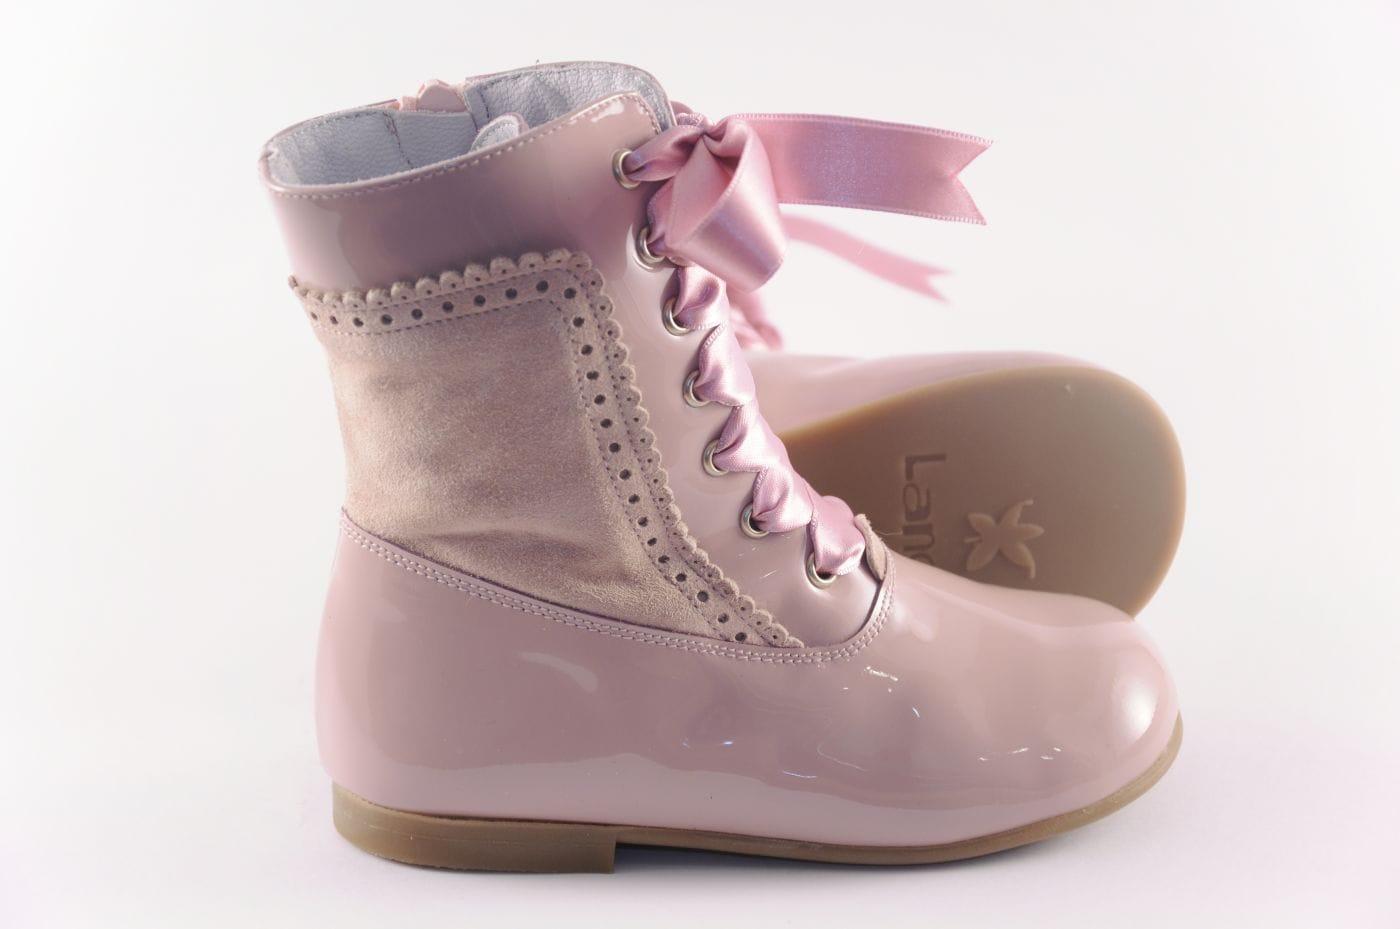 a383bdd026 Comprar zapato tipo JOVEN NIÑA estilo BOTAS COLOR ROSA CHAROL ...